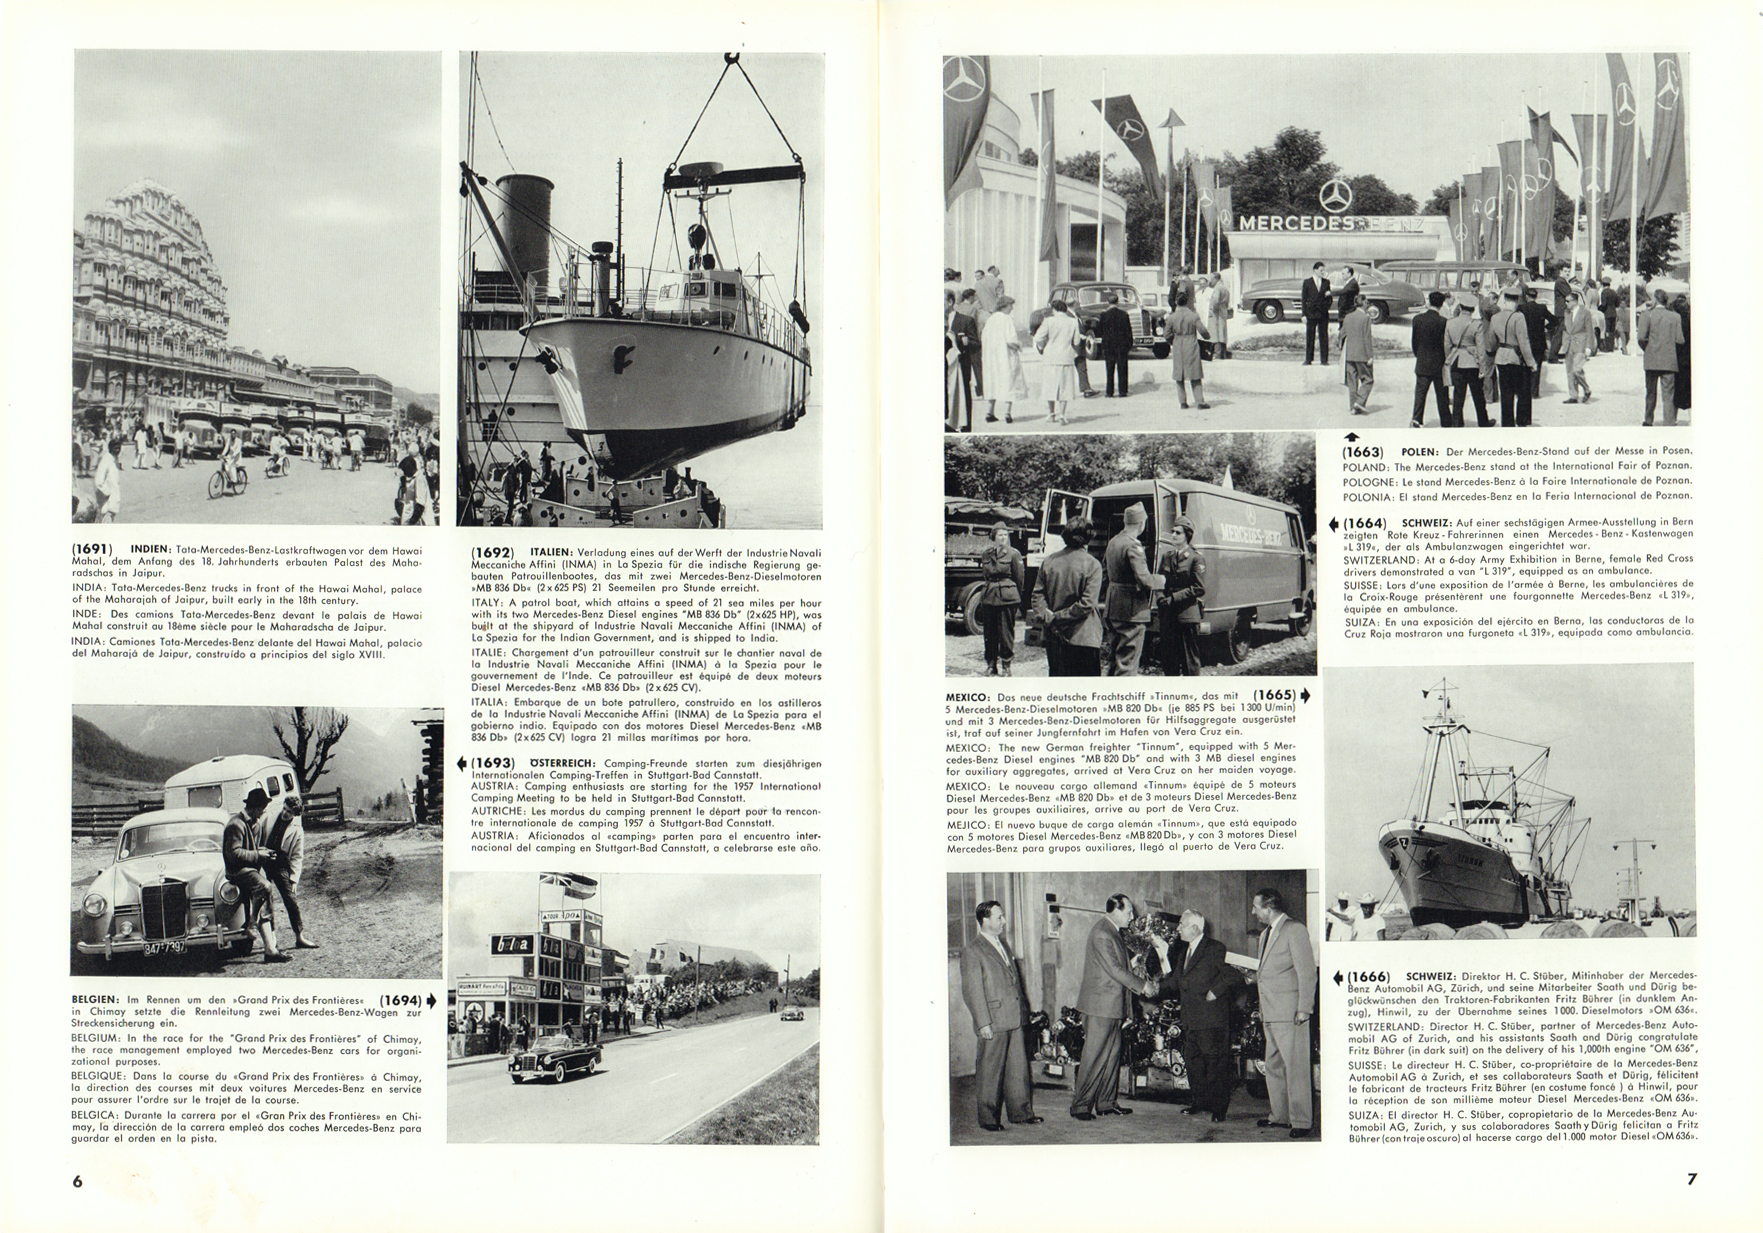 (REVISTA): Periódico In aller welt n.º 12 - Mercedes-Benz no mundo - 1957 - multilingue 004